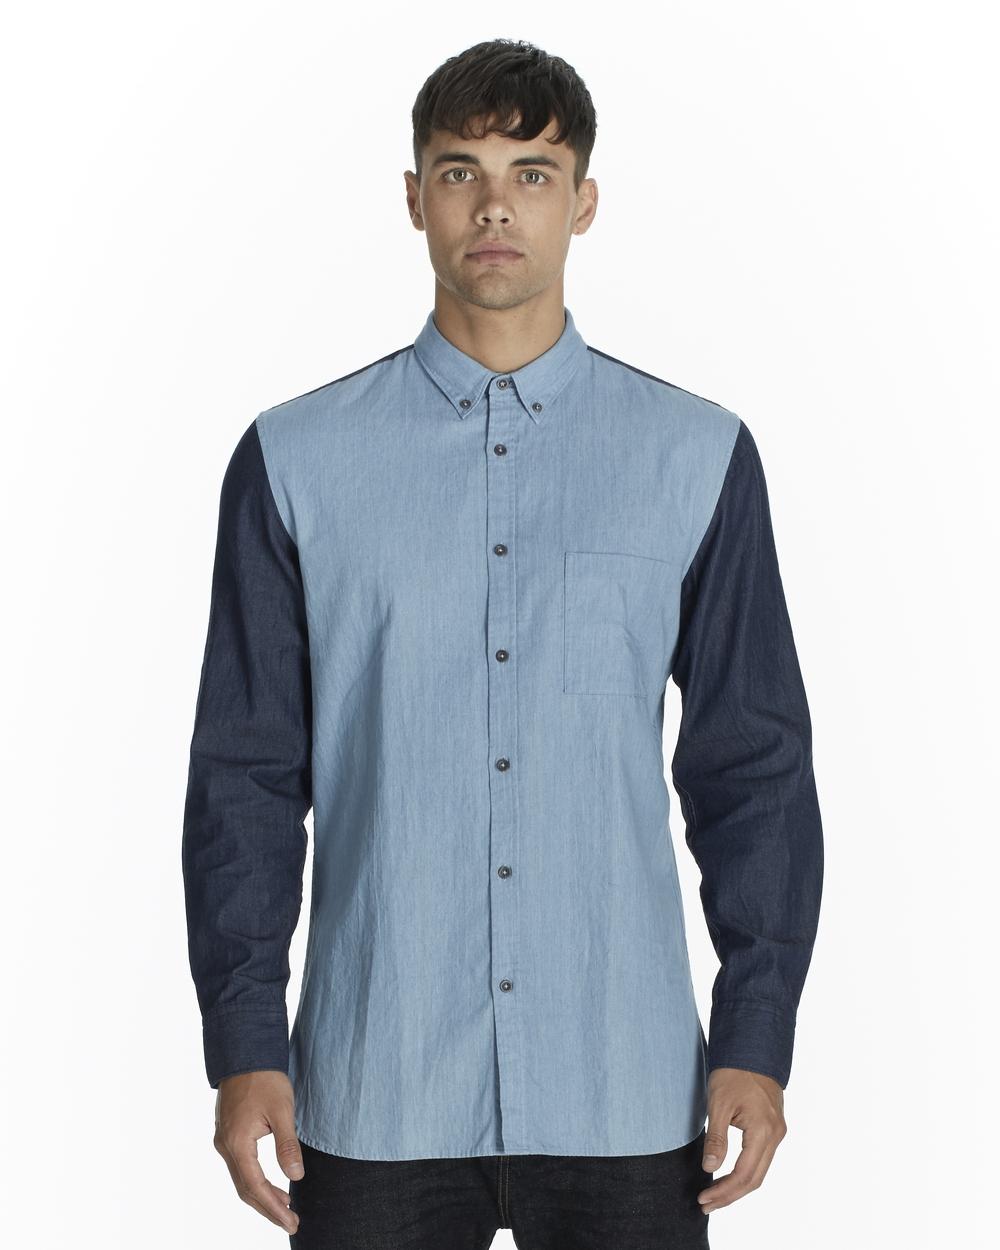 Zanerobe Denmix LS Shirt Indigo Wash Out